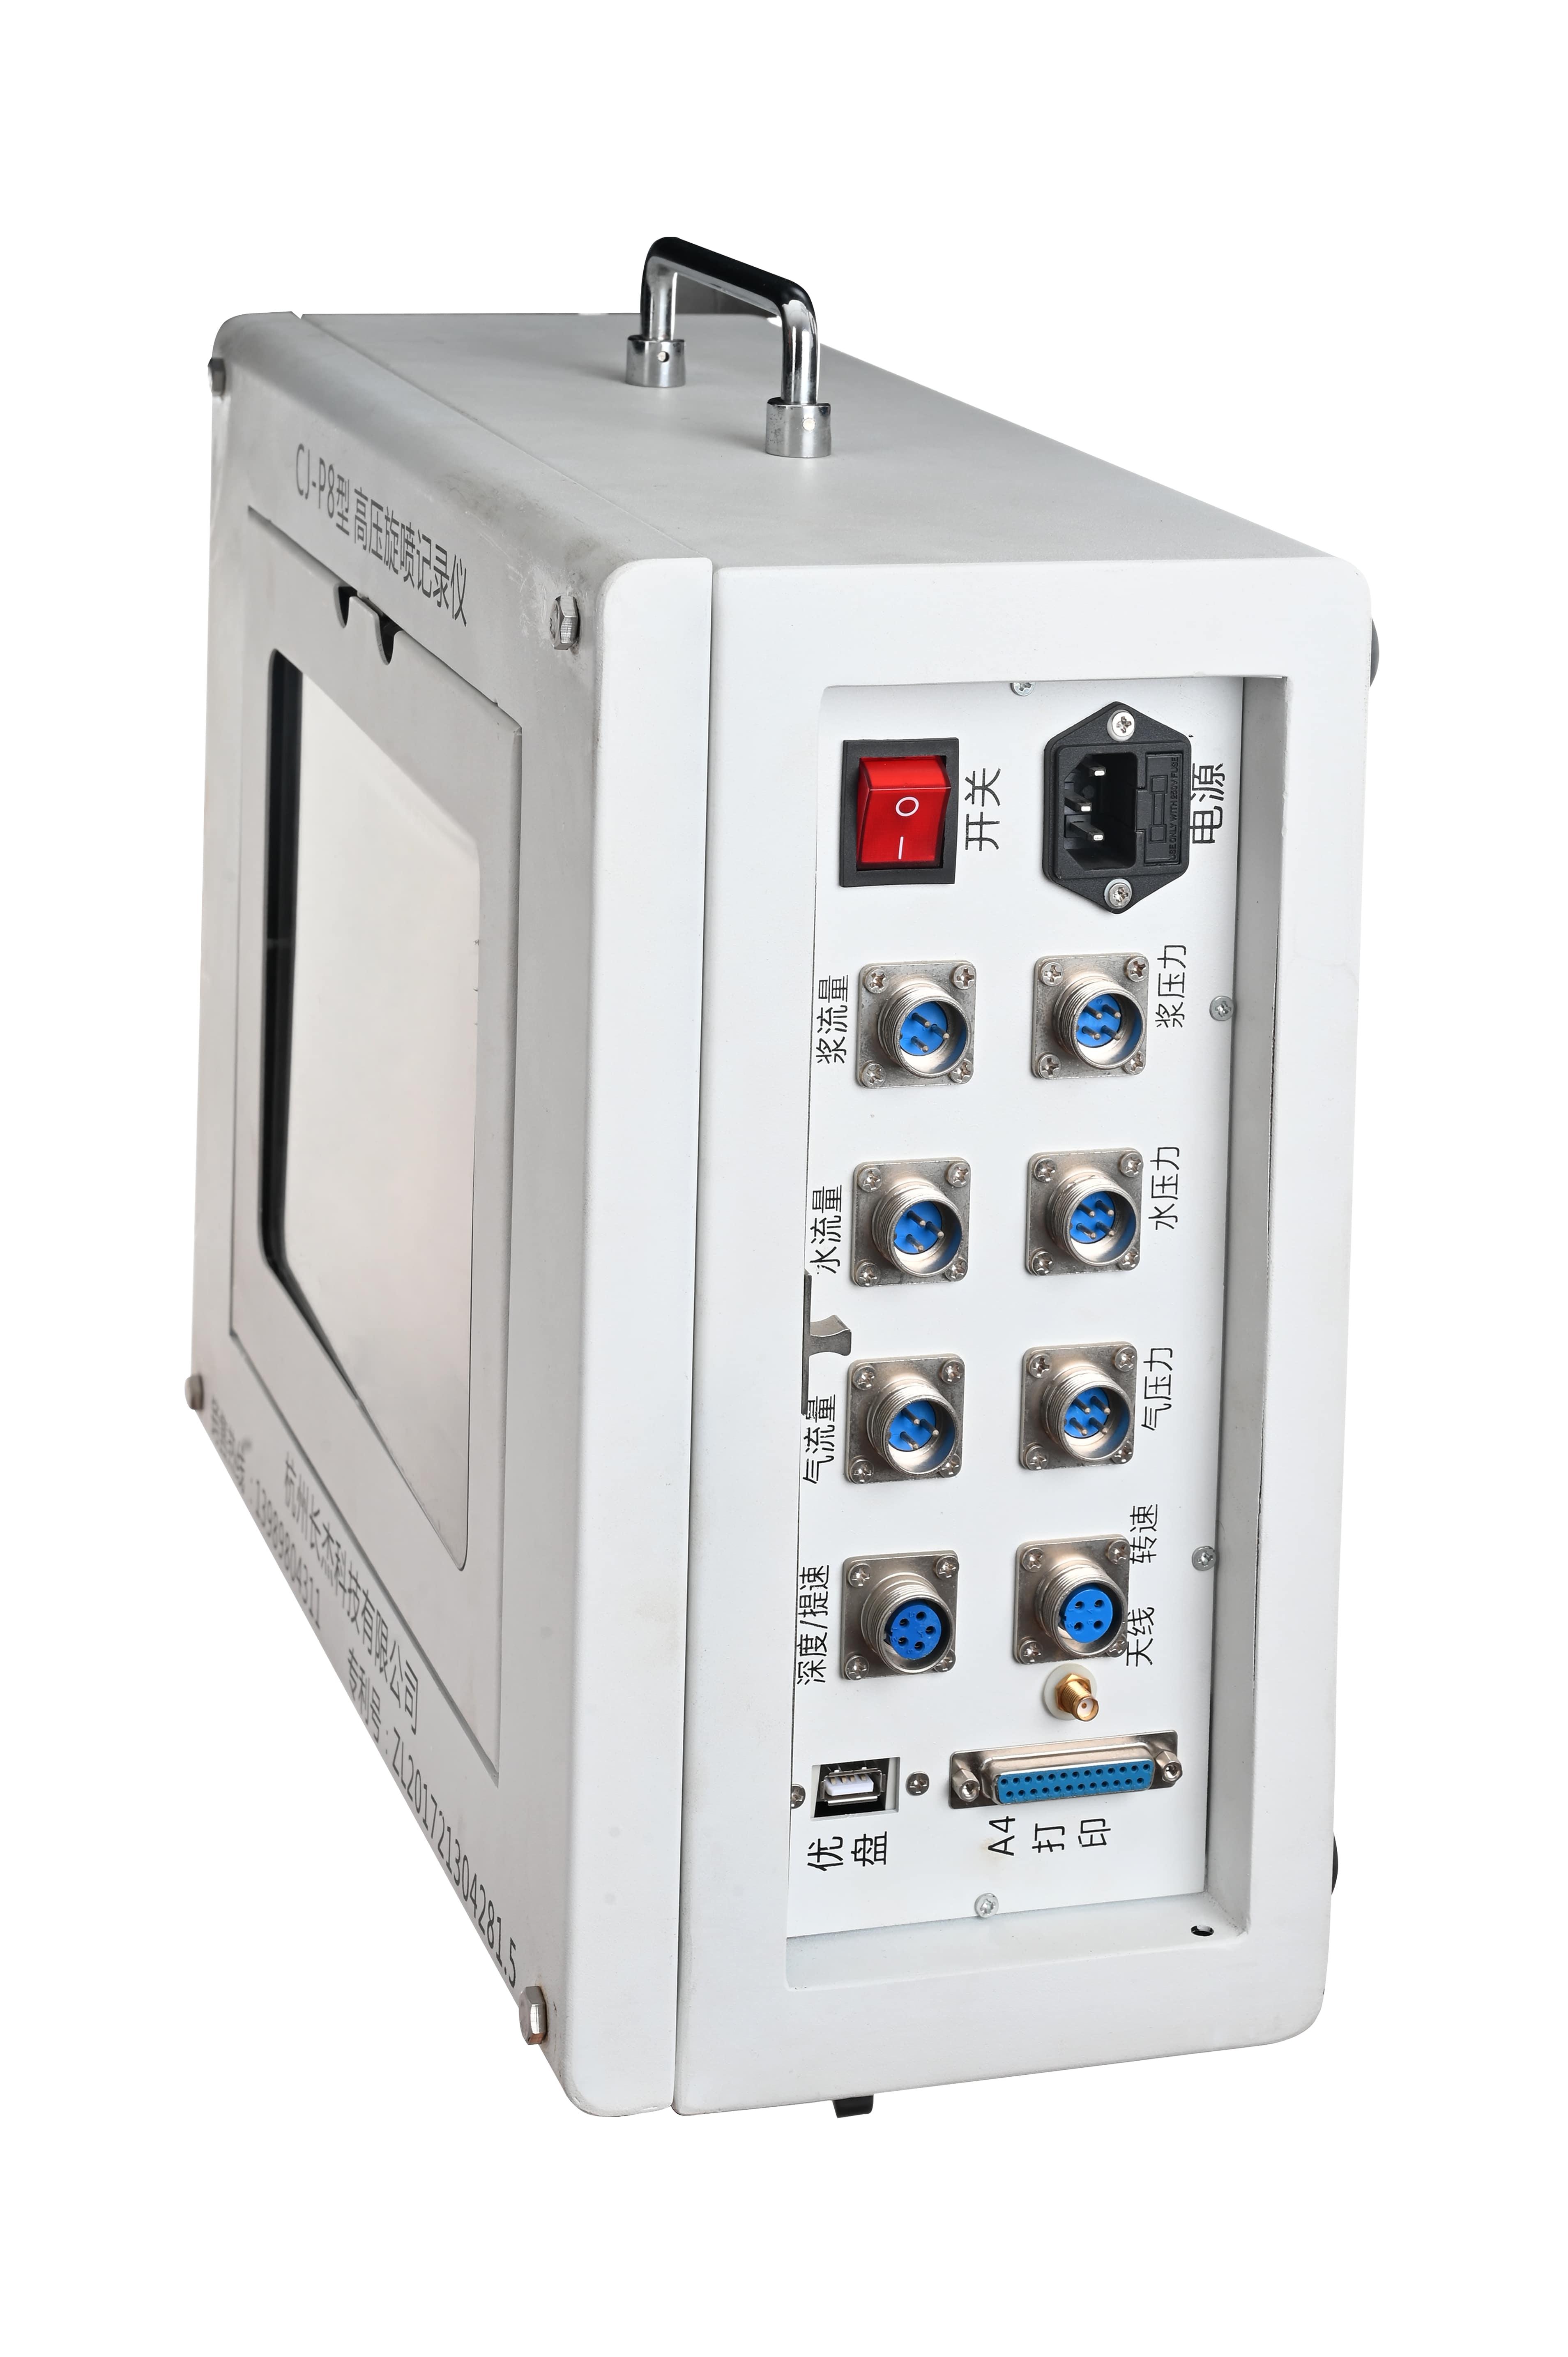 CJ-P8型灌浆记录仪(高喷)  灌浆记录仪